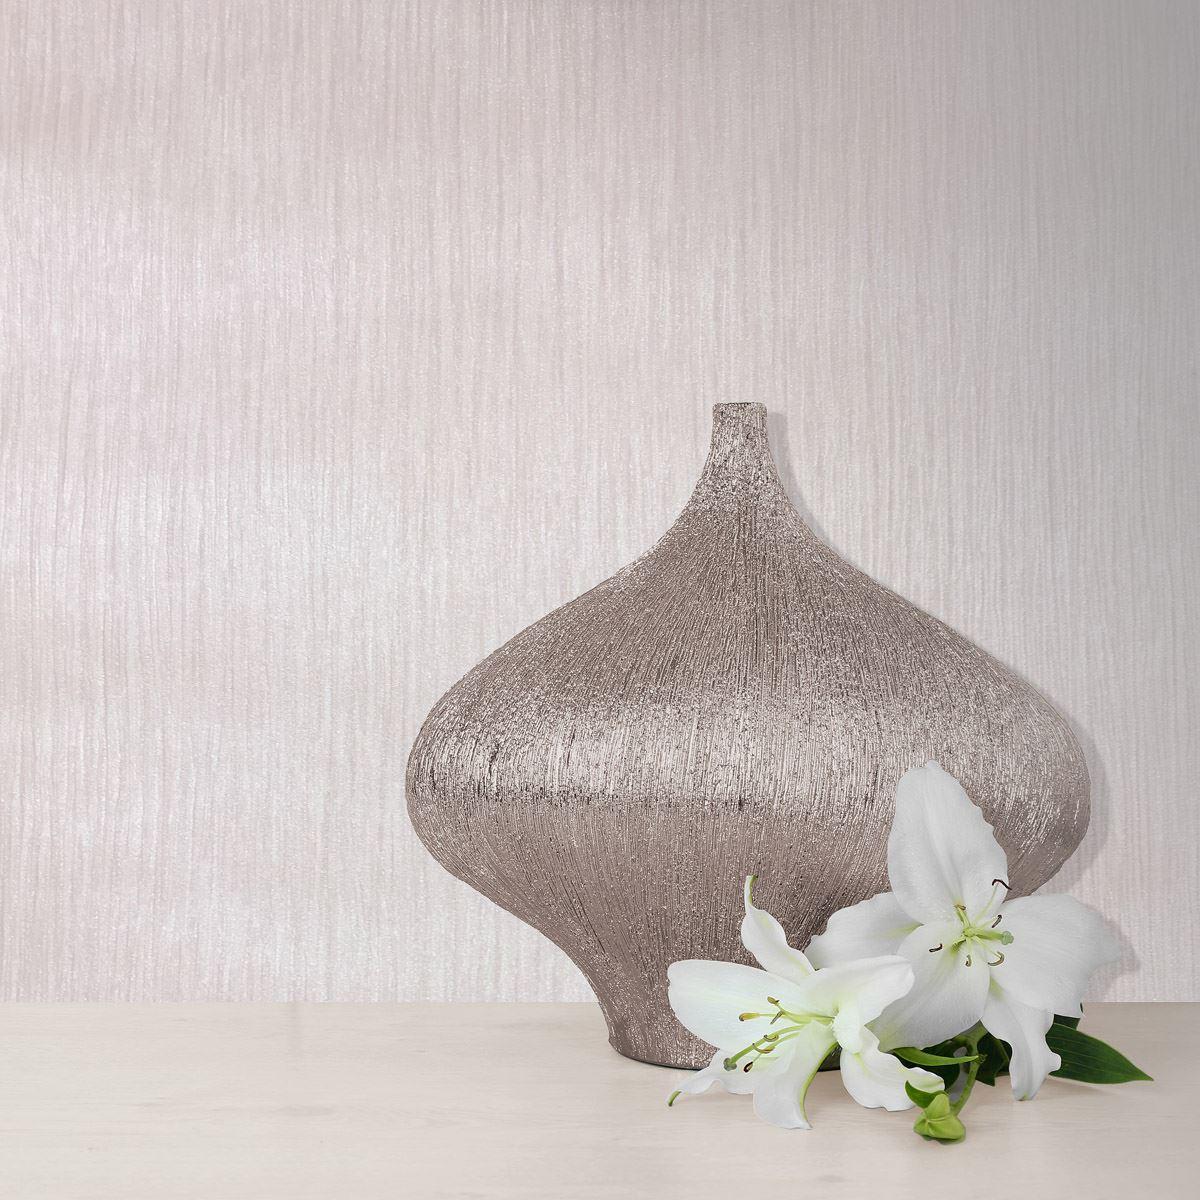 3 x Textured Fawn Rose Wallpaper Fabric Effect Linear Plain Shiny Finish Muriva